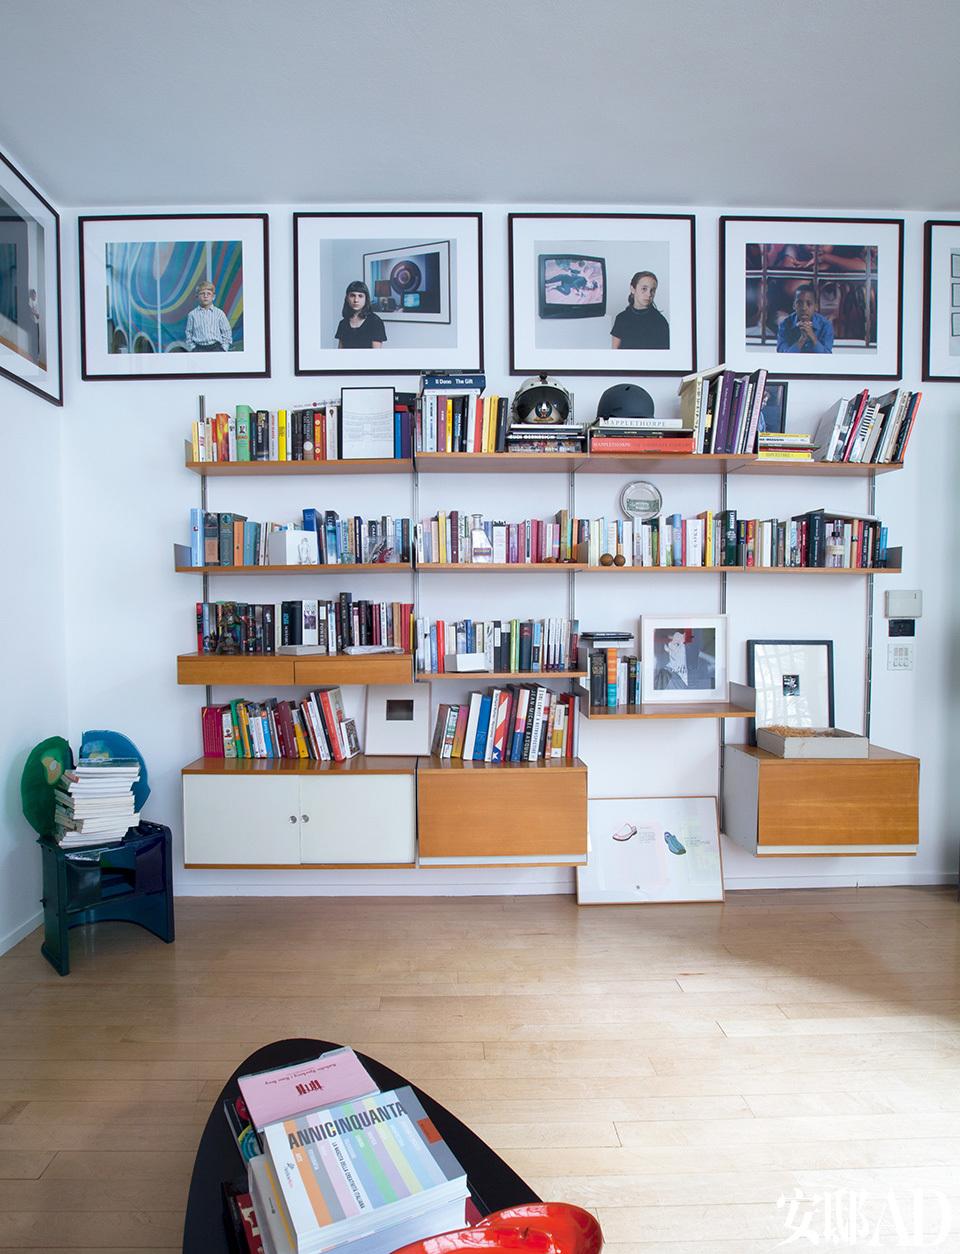 Marconi收藏的艺术画册整齐地摆放在复 古书架上,成为最佳的墙面装饰。墙上的摄影作品出自 Christian Jankowski,左侧的树脂椅是设计师Gaetano Pesce的作品。